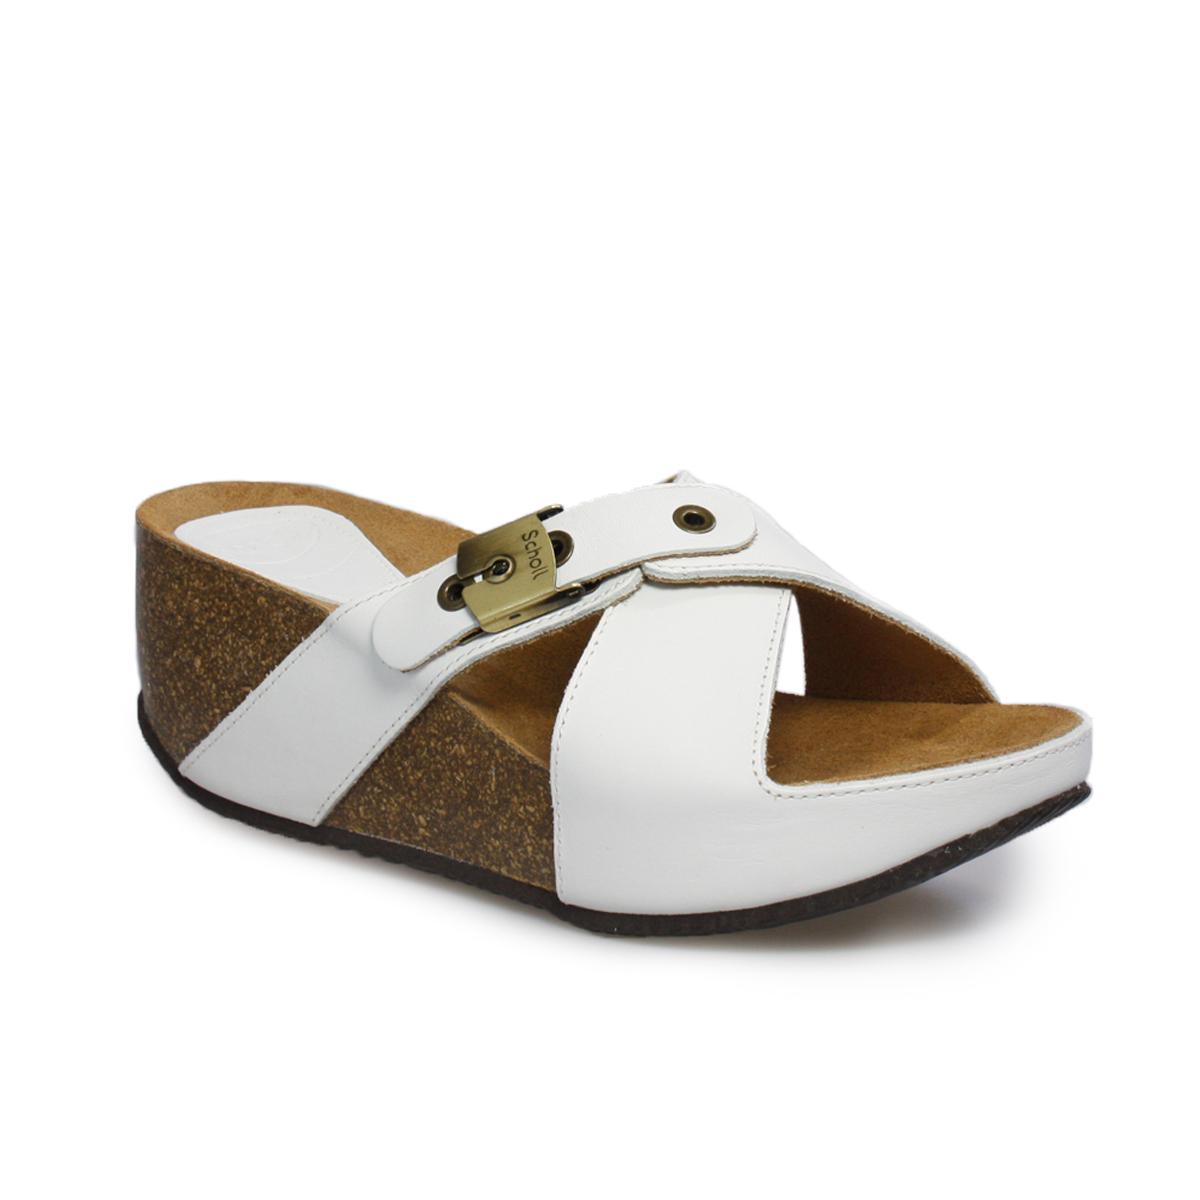 Womens sandals ebay - Scholl Elon 1 2 Off White Brown Leather Womens Buckle Platform Sandals Size 3 8